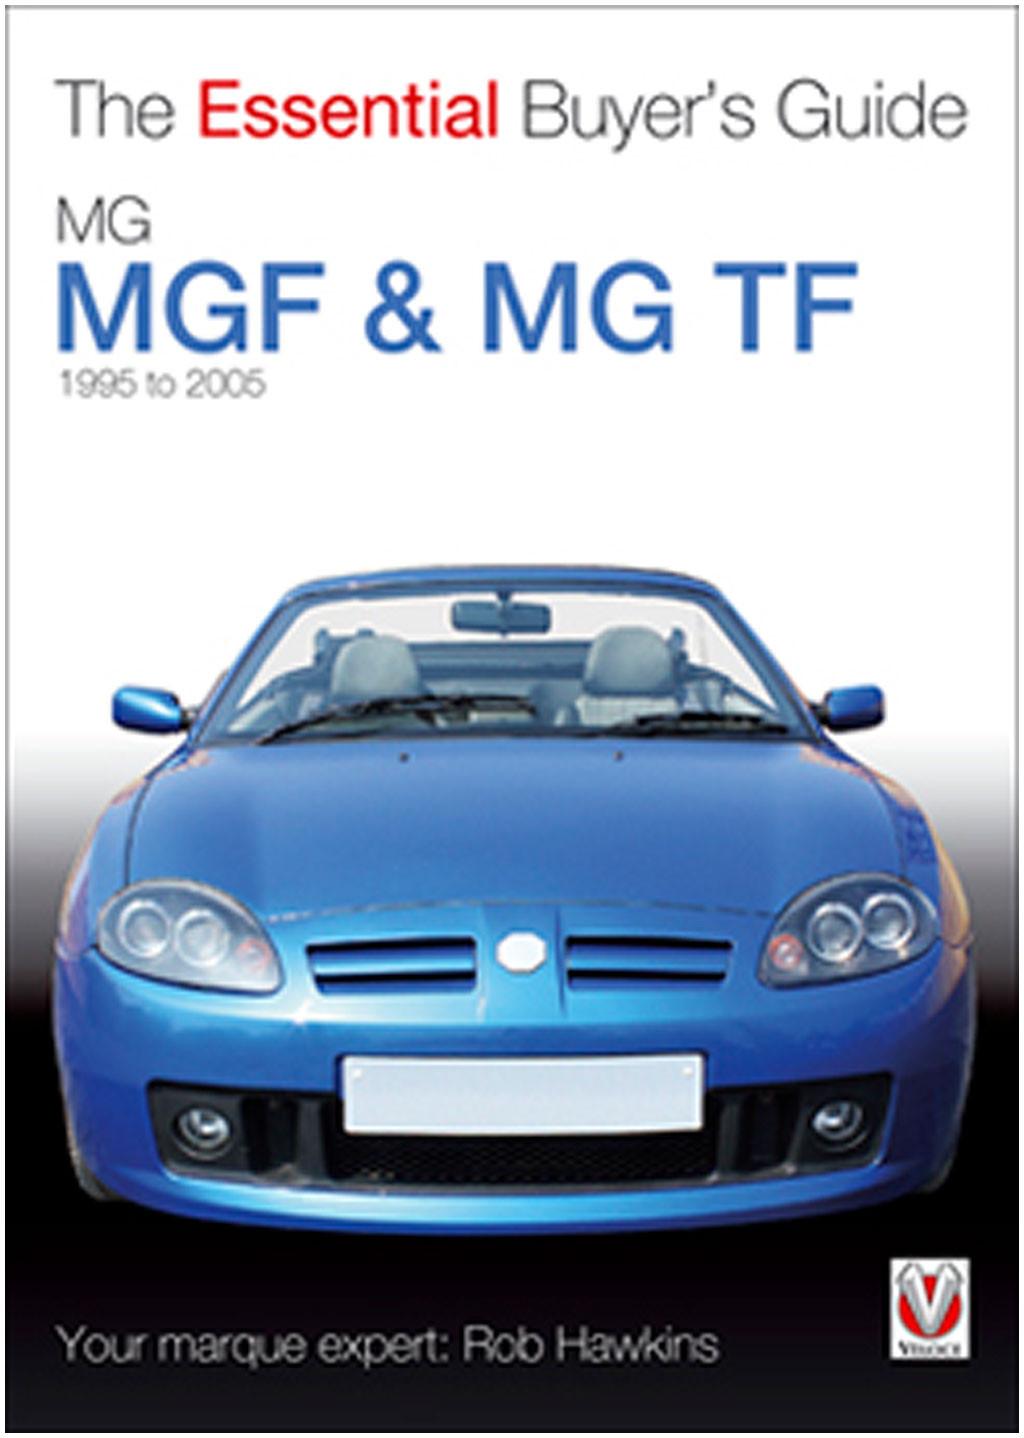 MGF & MG TF